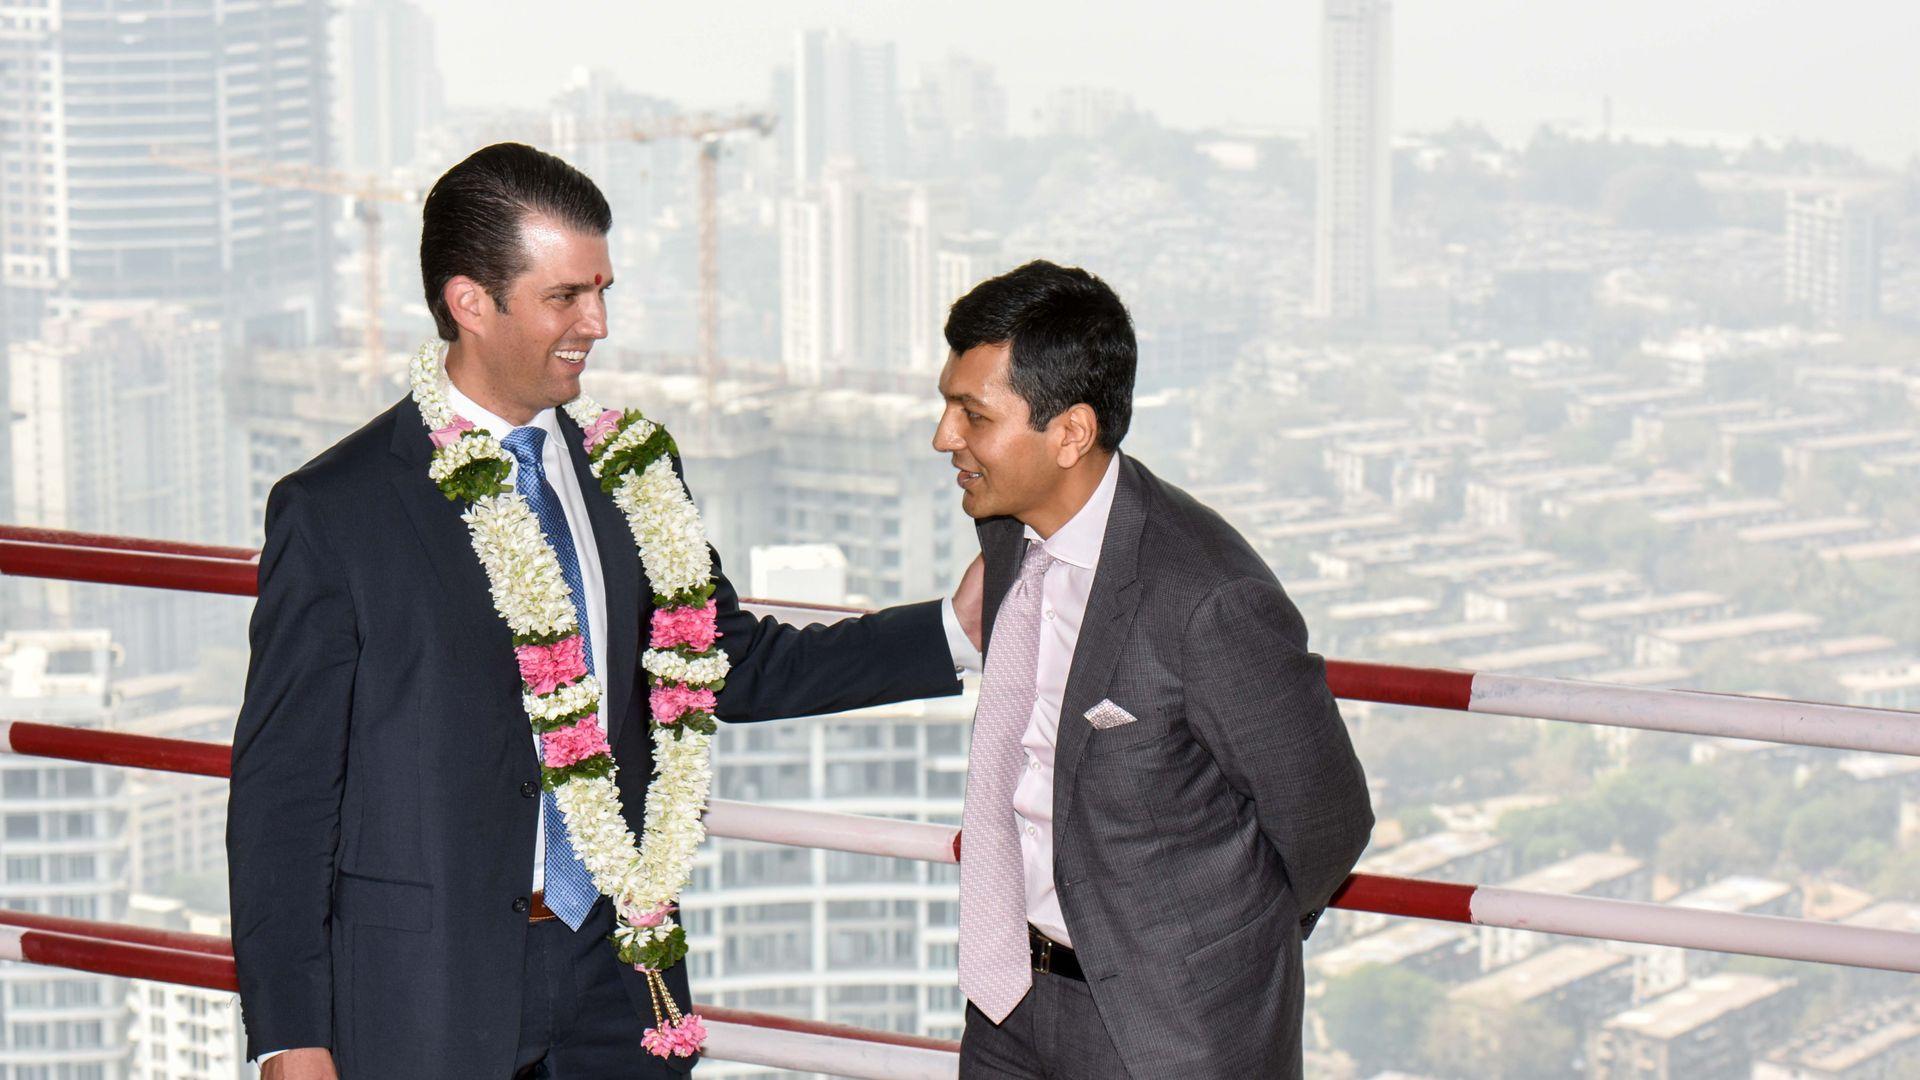 Trump Jr. and indian businessman